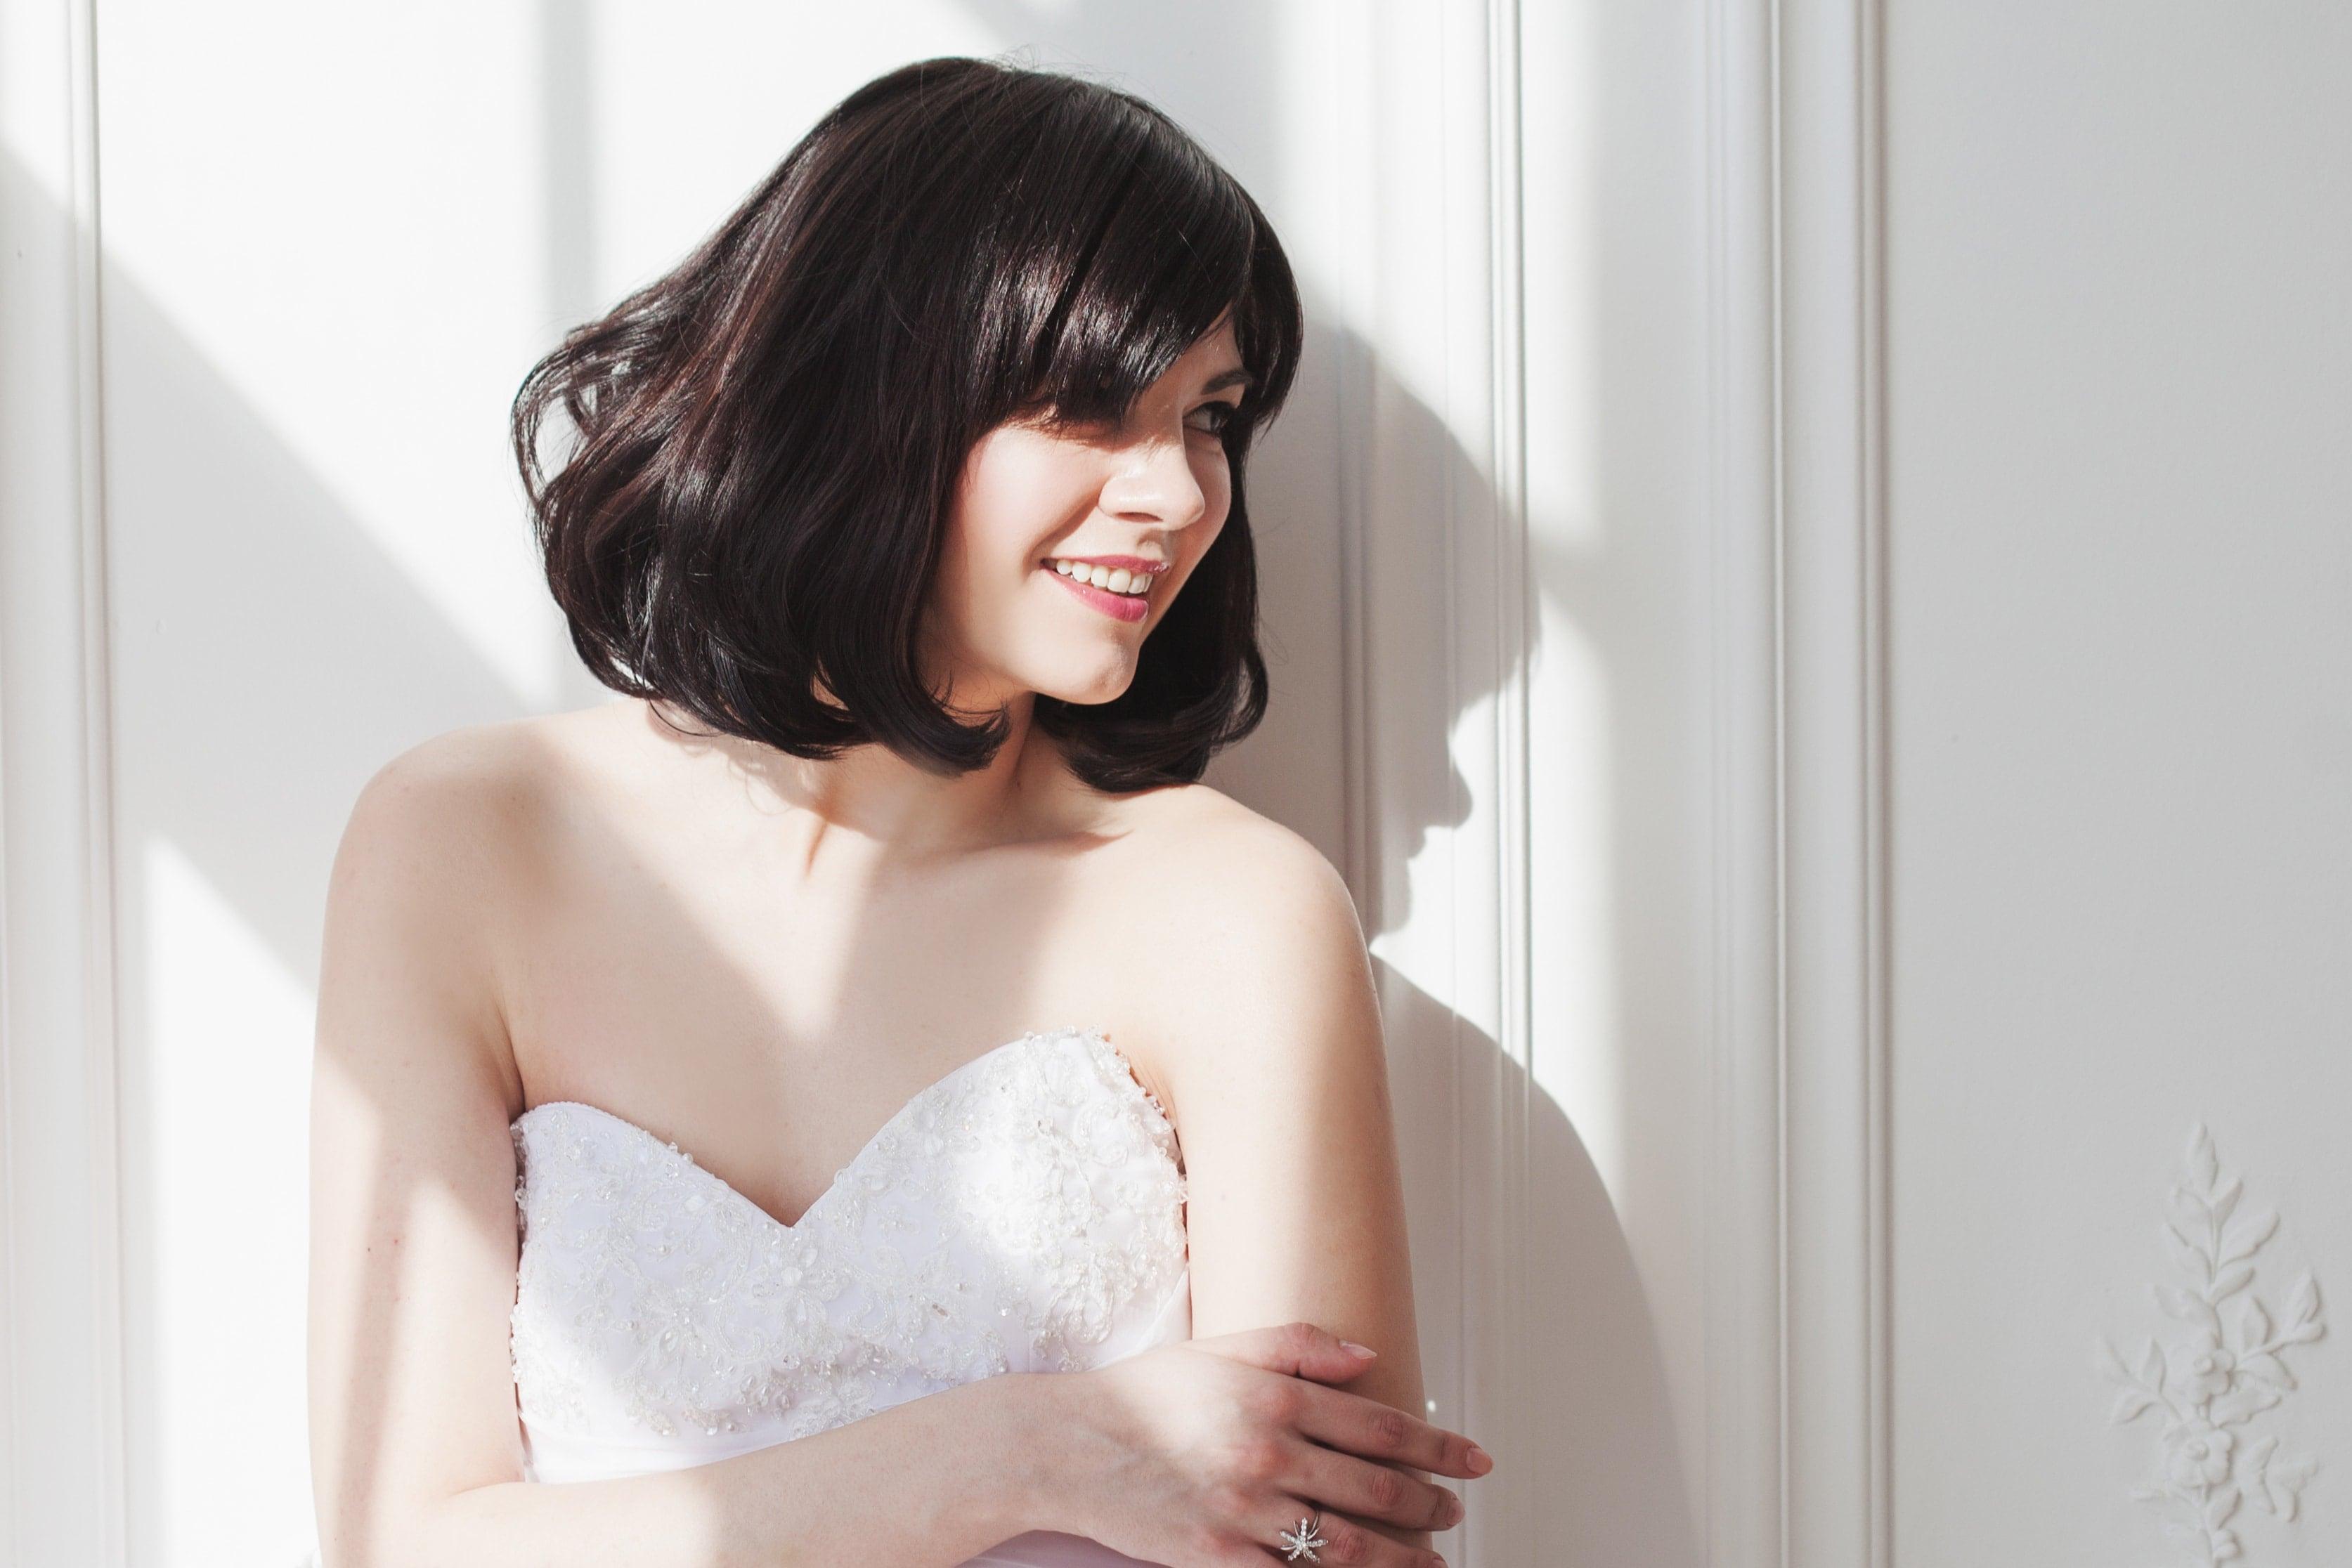 short messy hairstyles long bangs volumized blowout brunette